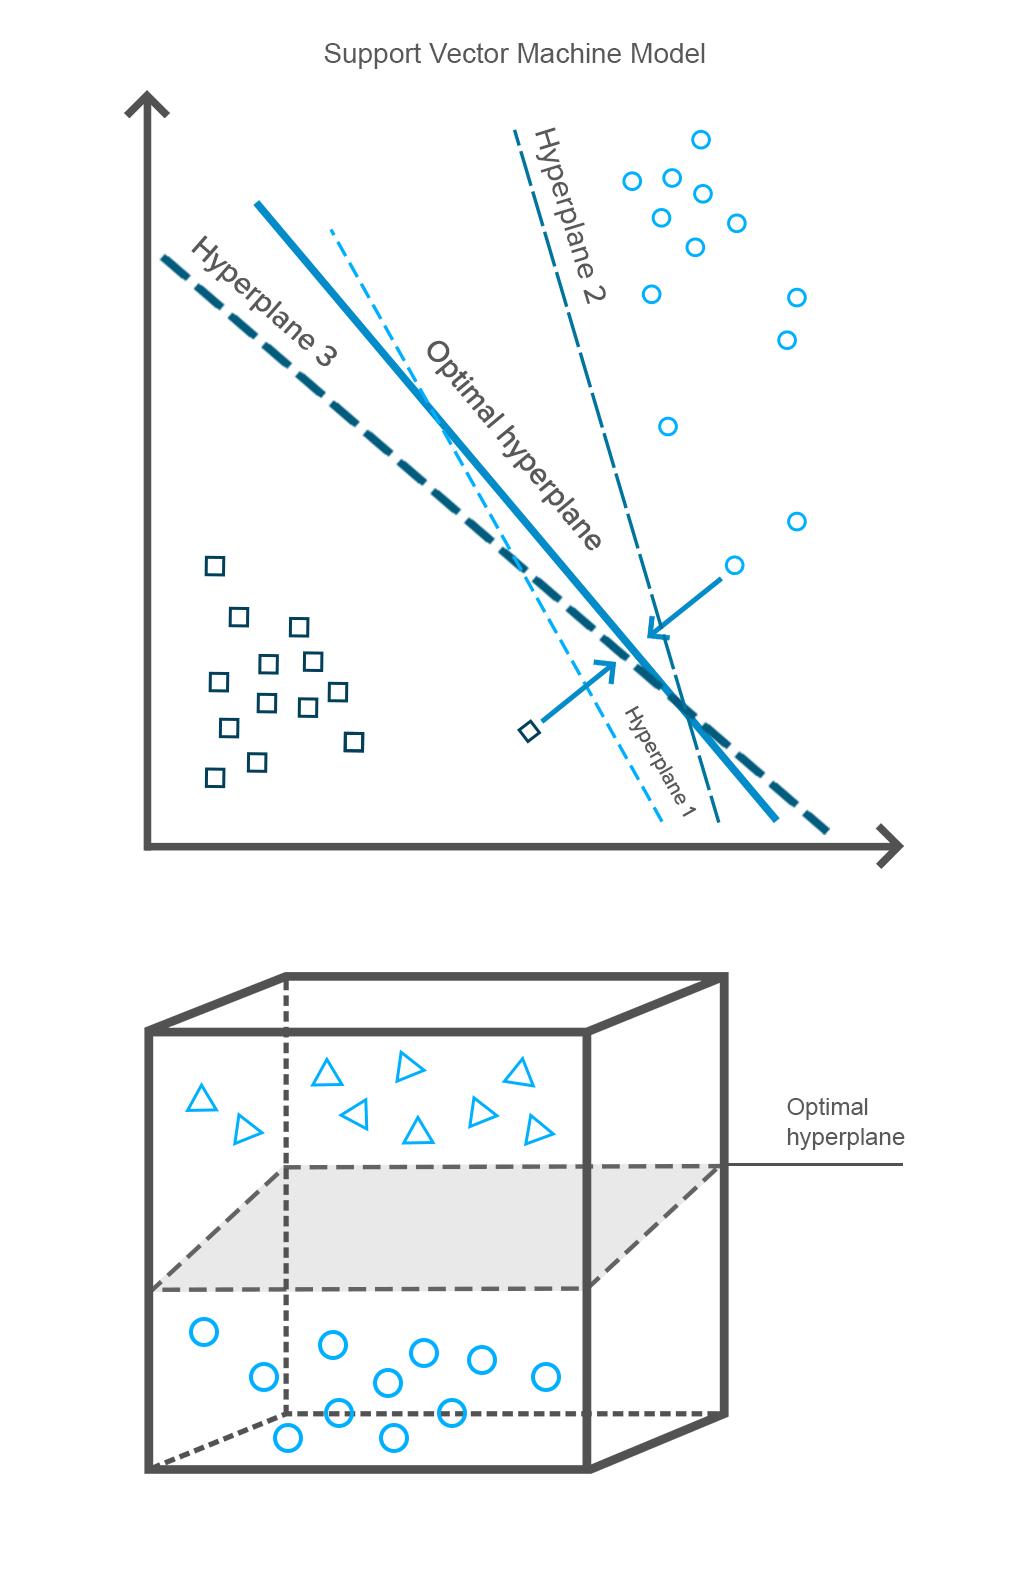 Support Vector Machine Model